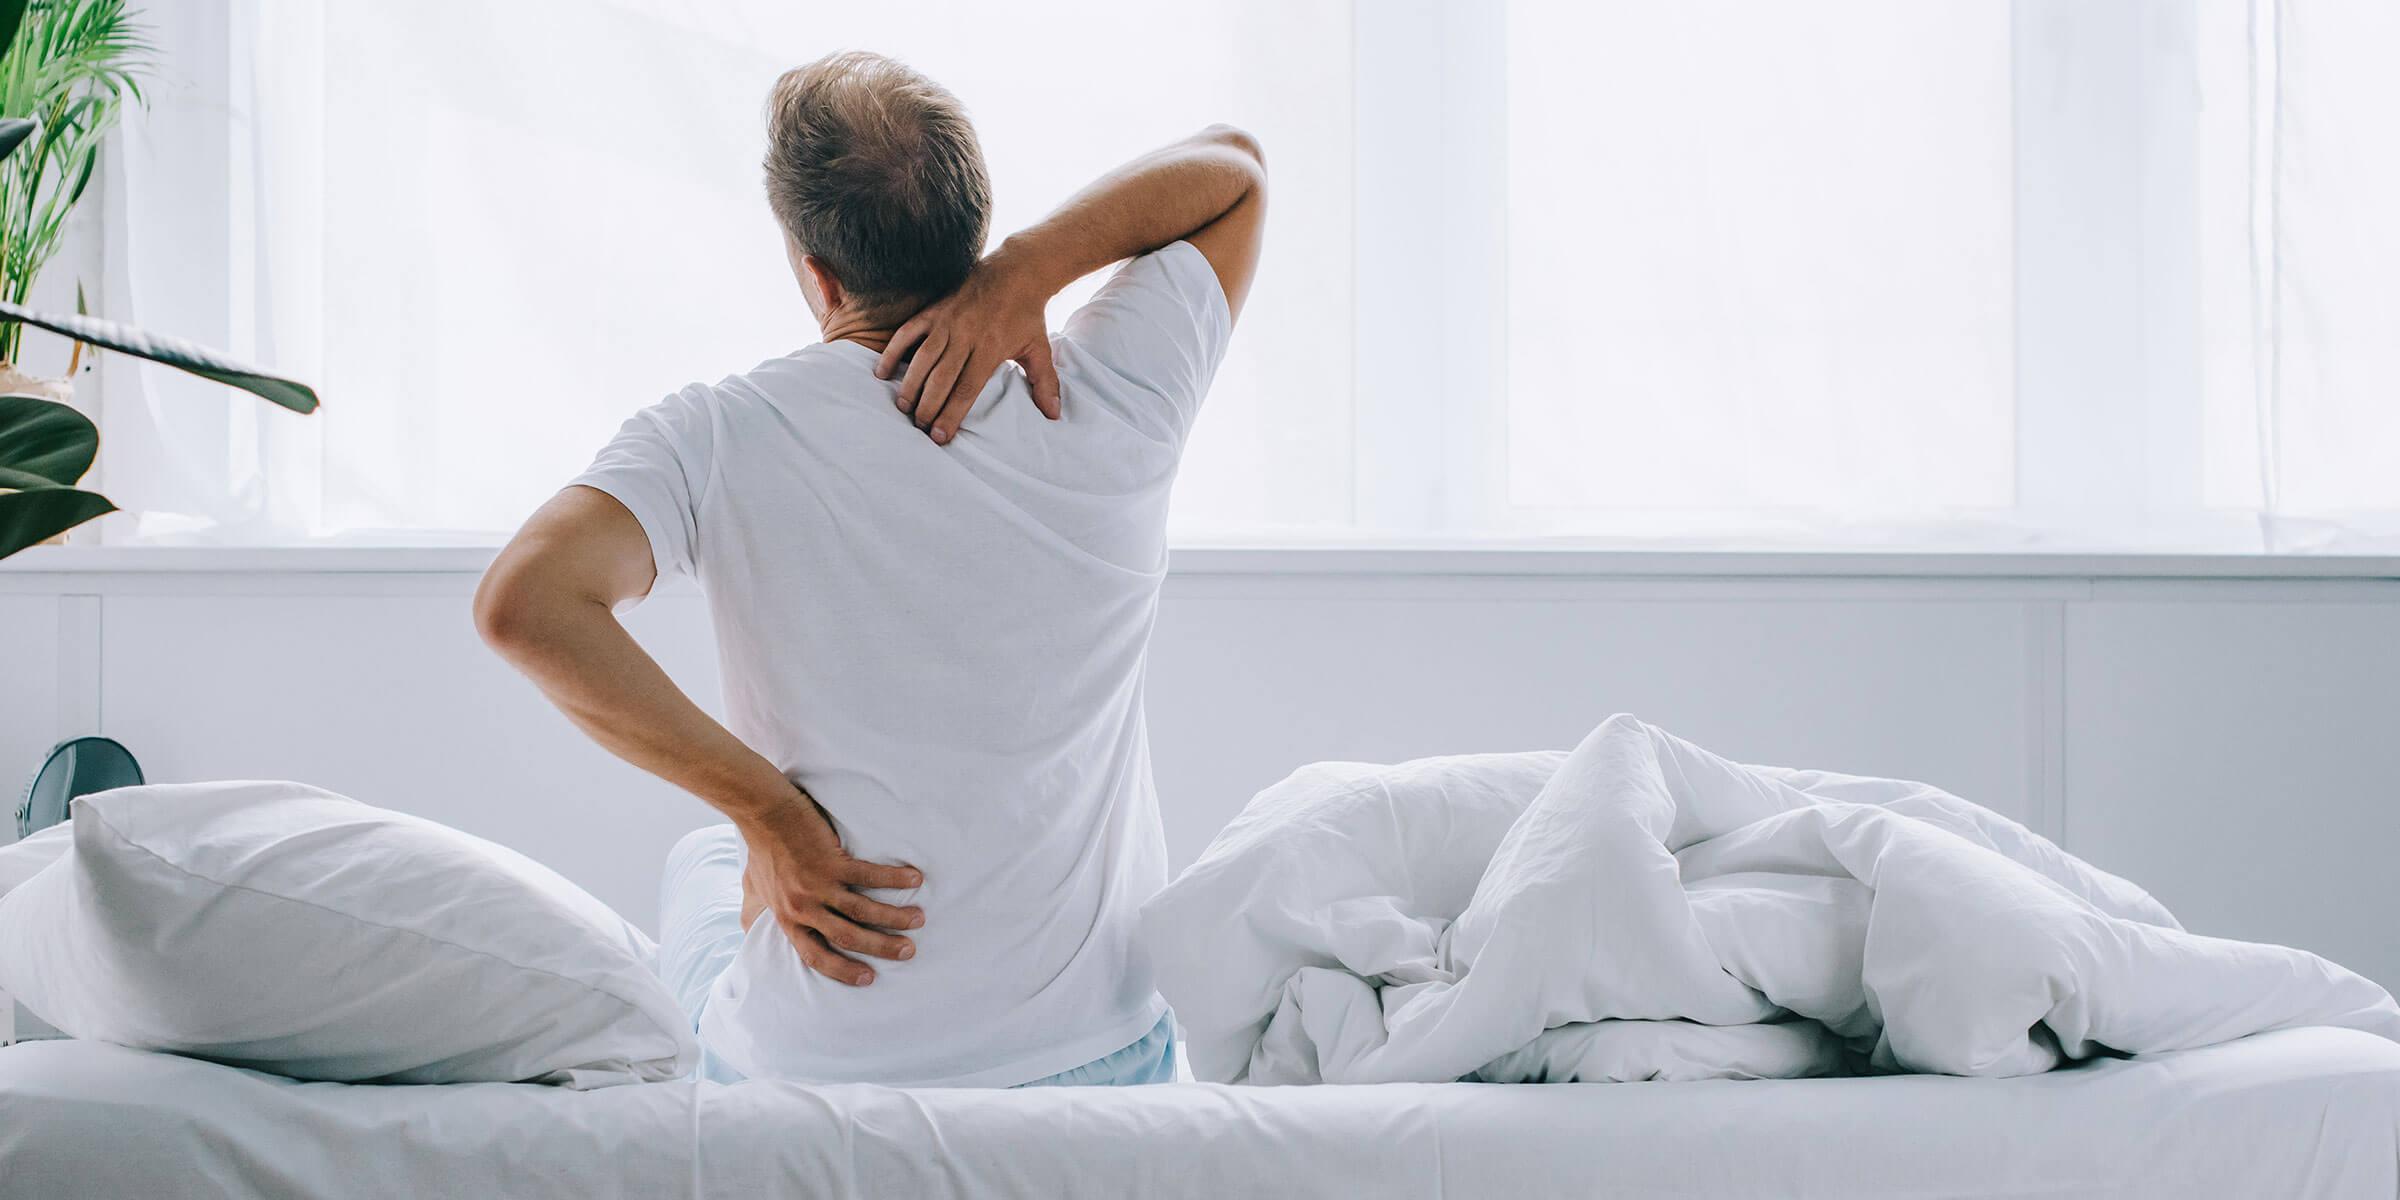 Back Pain Vitamin D deficiency and Symptom